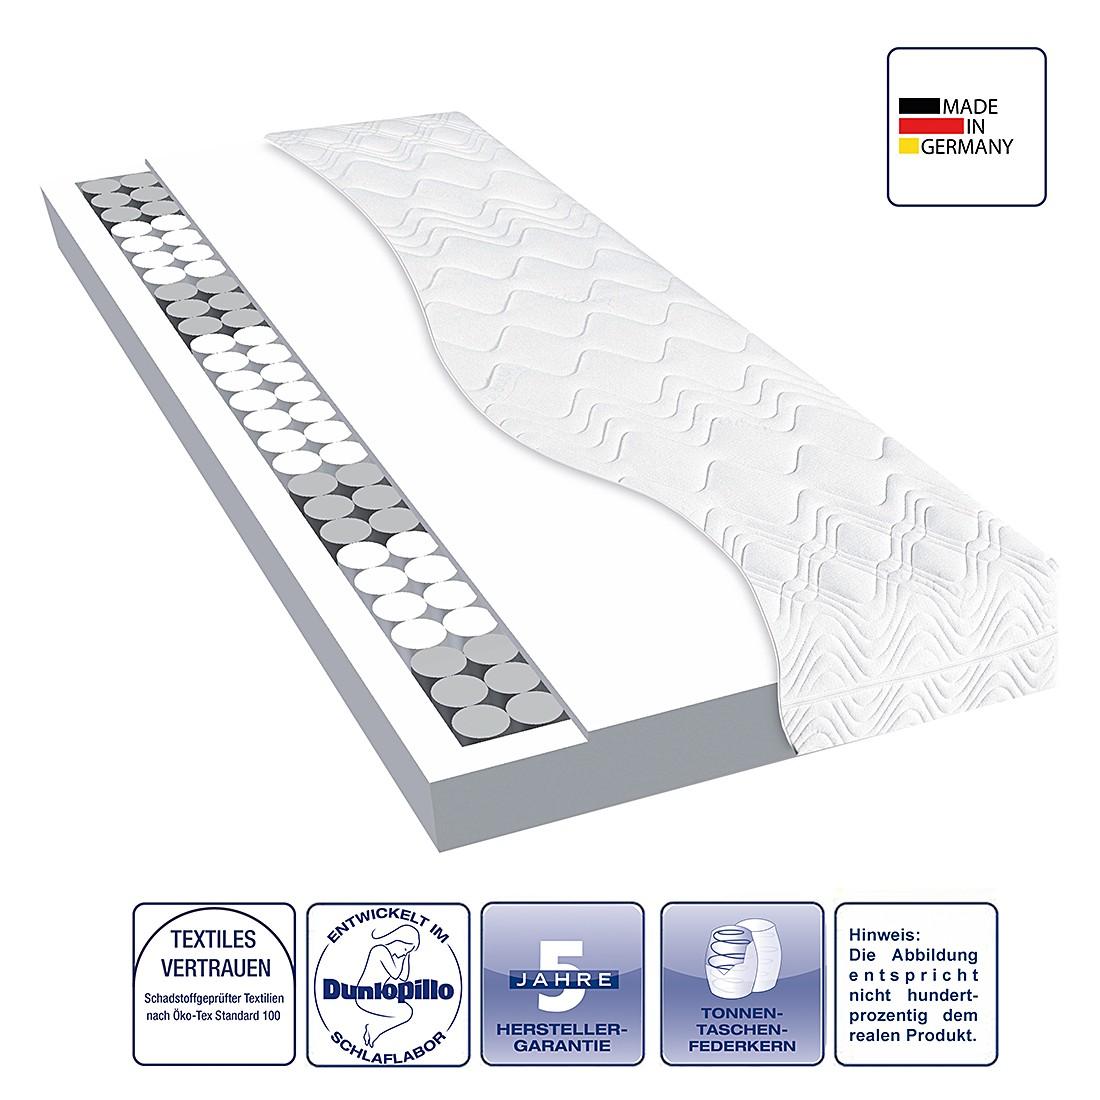 taschenfederkernmatratze aqualite 2500 80 x 200cm h2 bis 80 kg dunlopillo g nstig. Black Bedroom Furniture Sets. Home Design Ideas